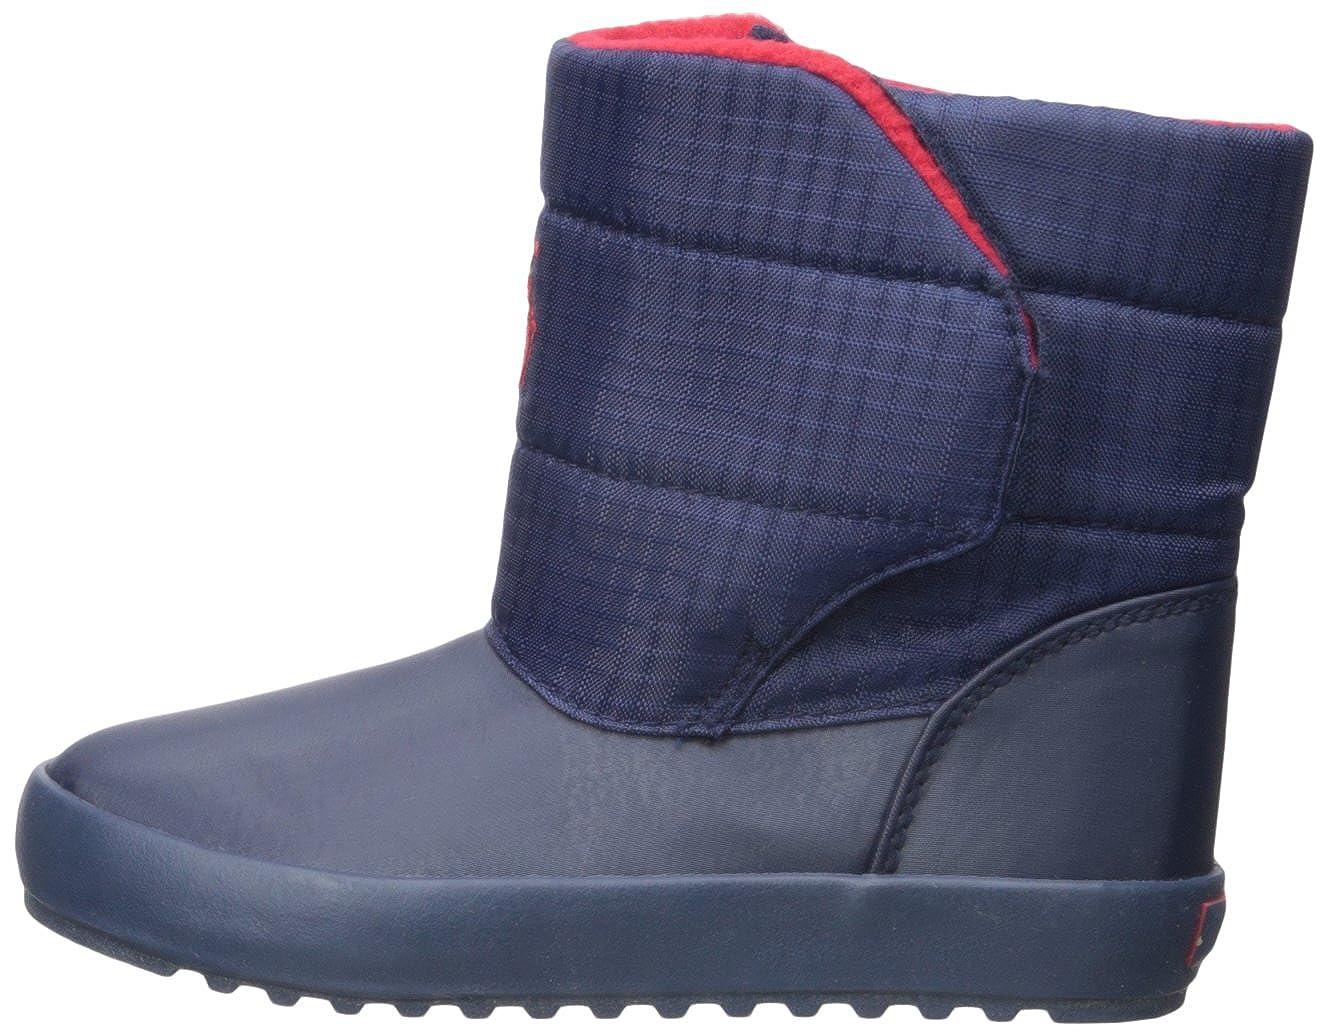 aee0f190511 Polo Ralph Lauren Kids 993552 Snow Boot